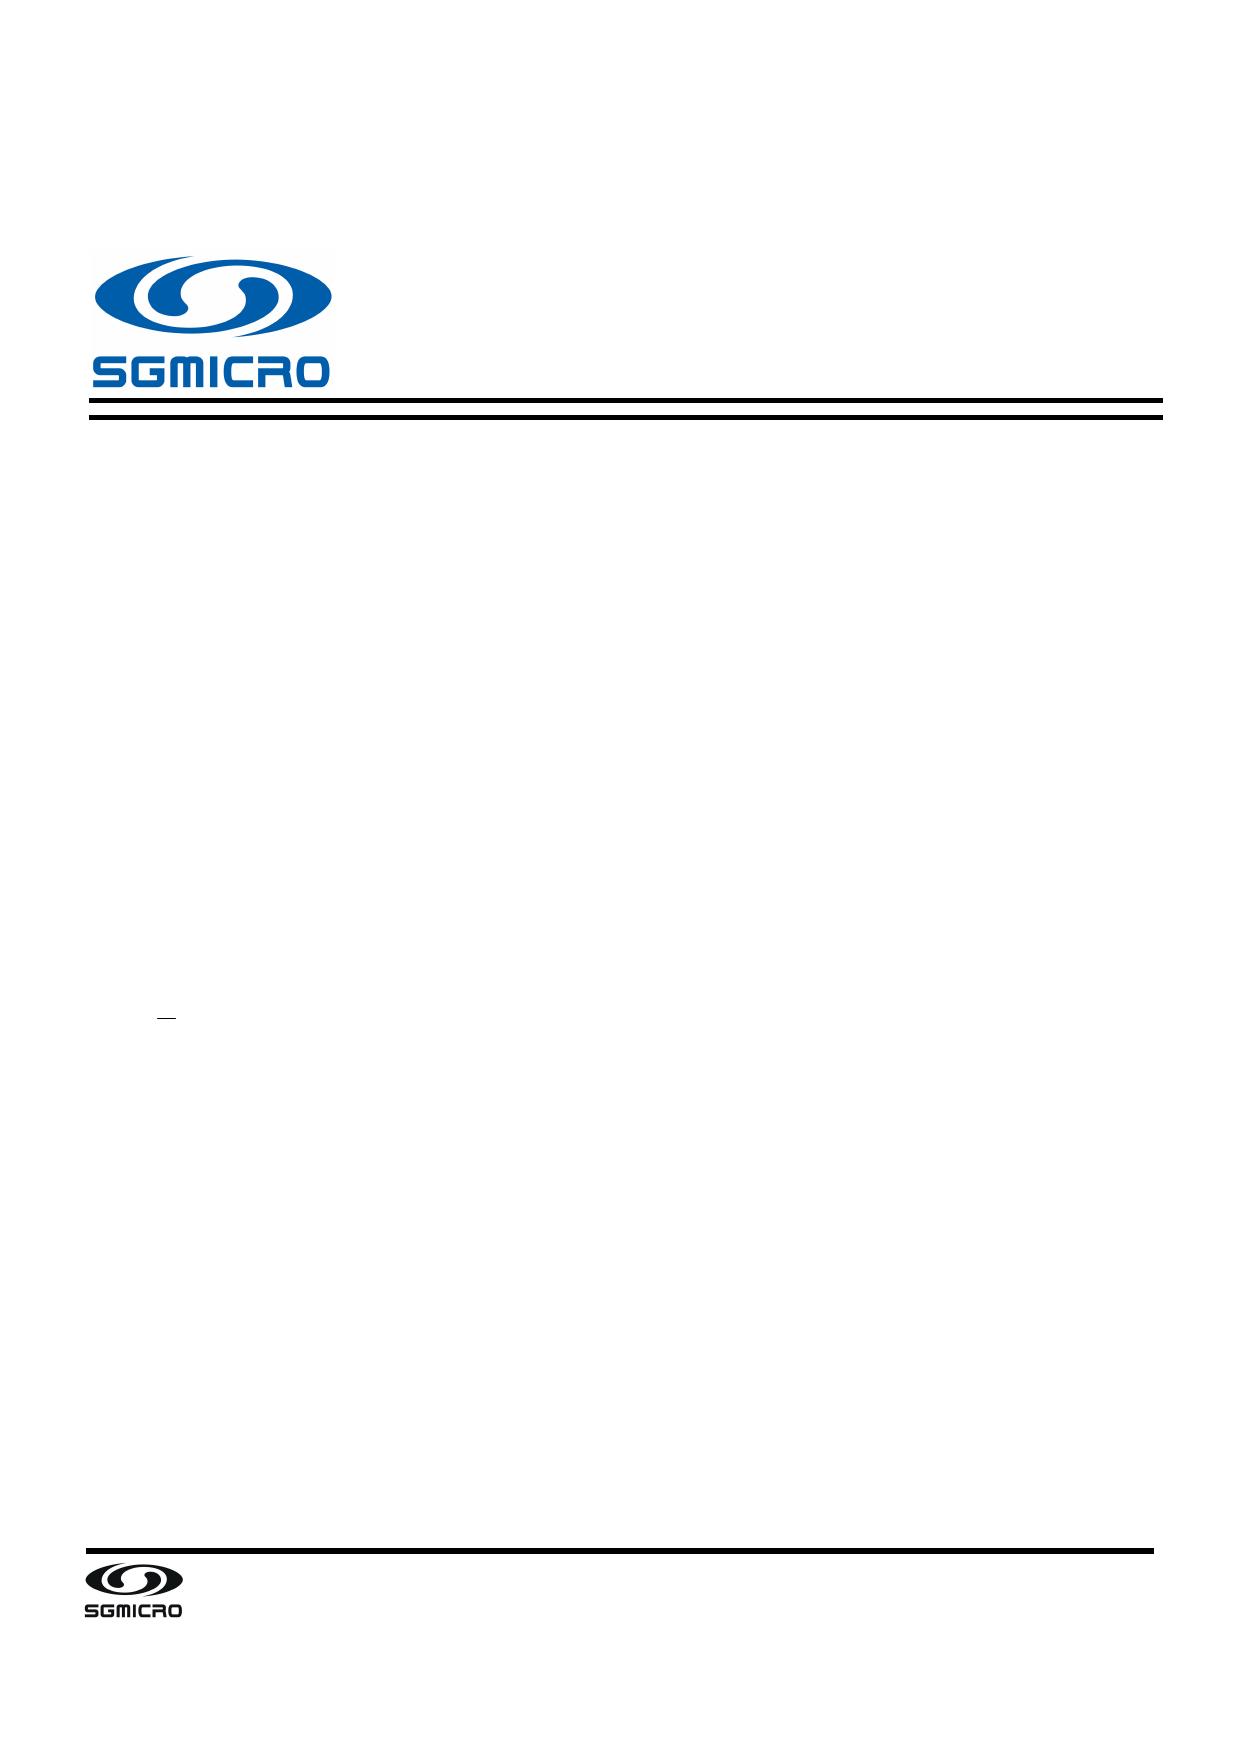 SGM8703 datasheet, circuit